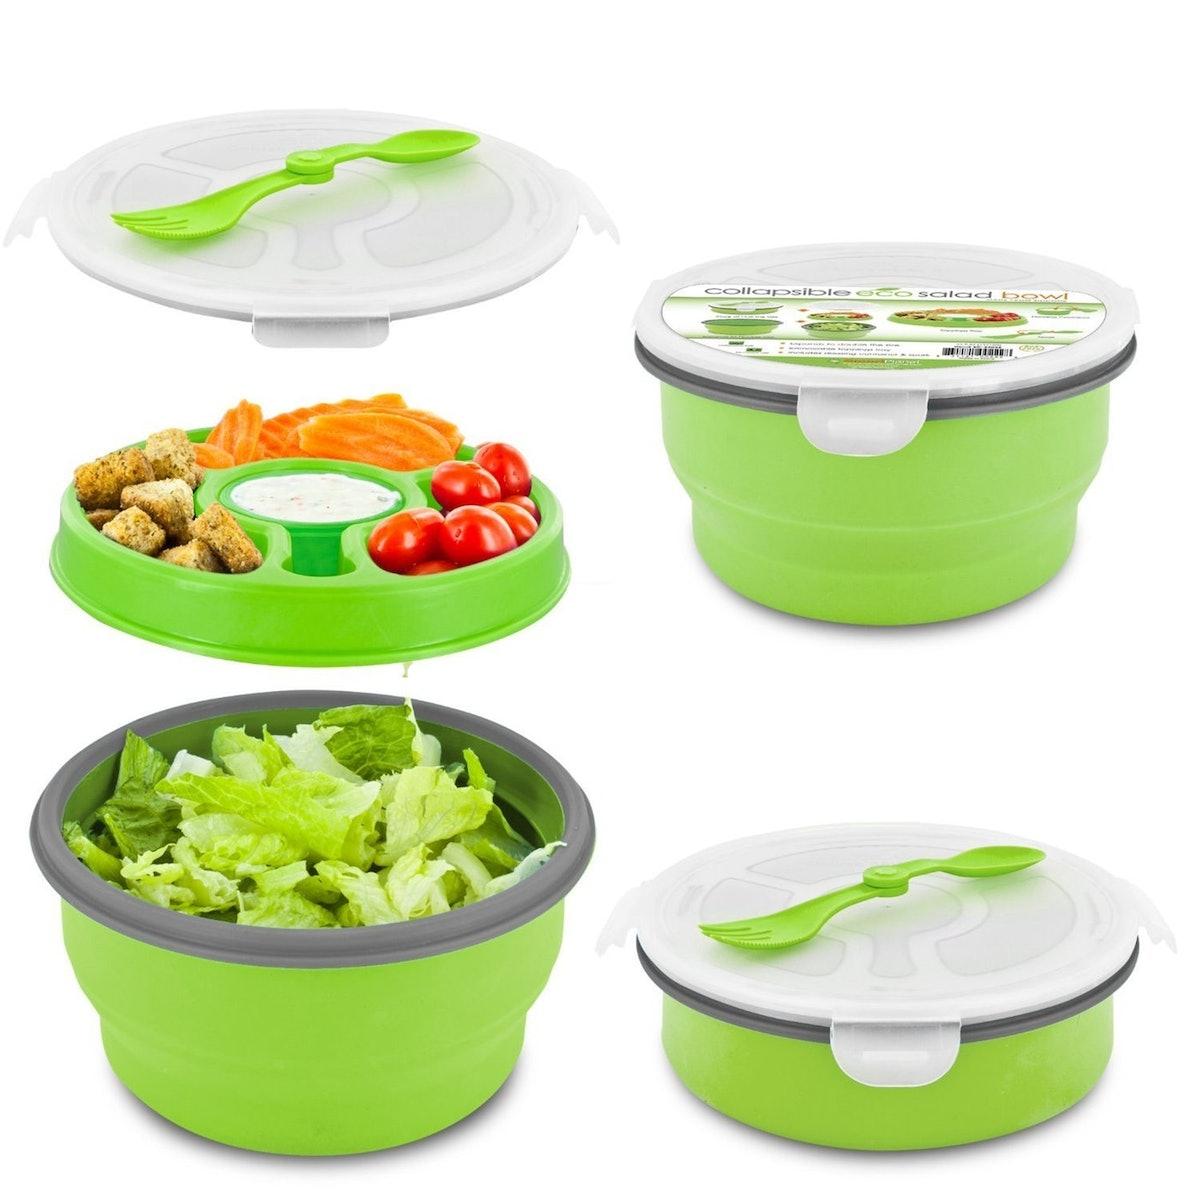 Smart Planet Collapsible Salad Bowl